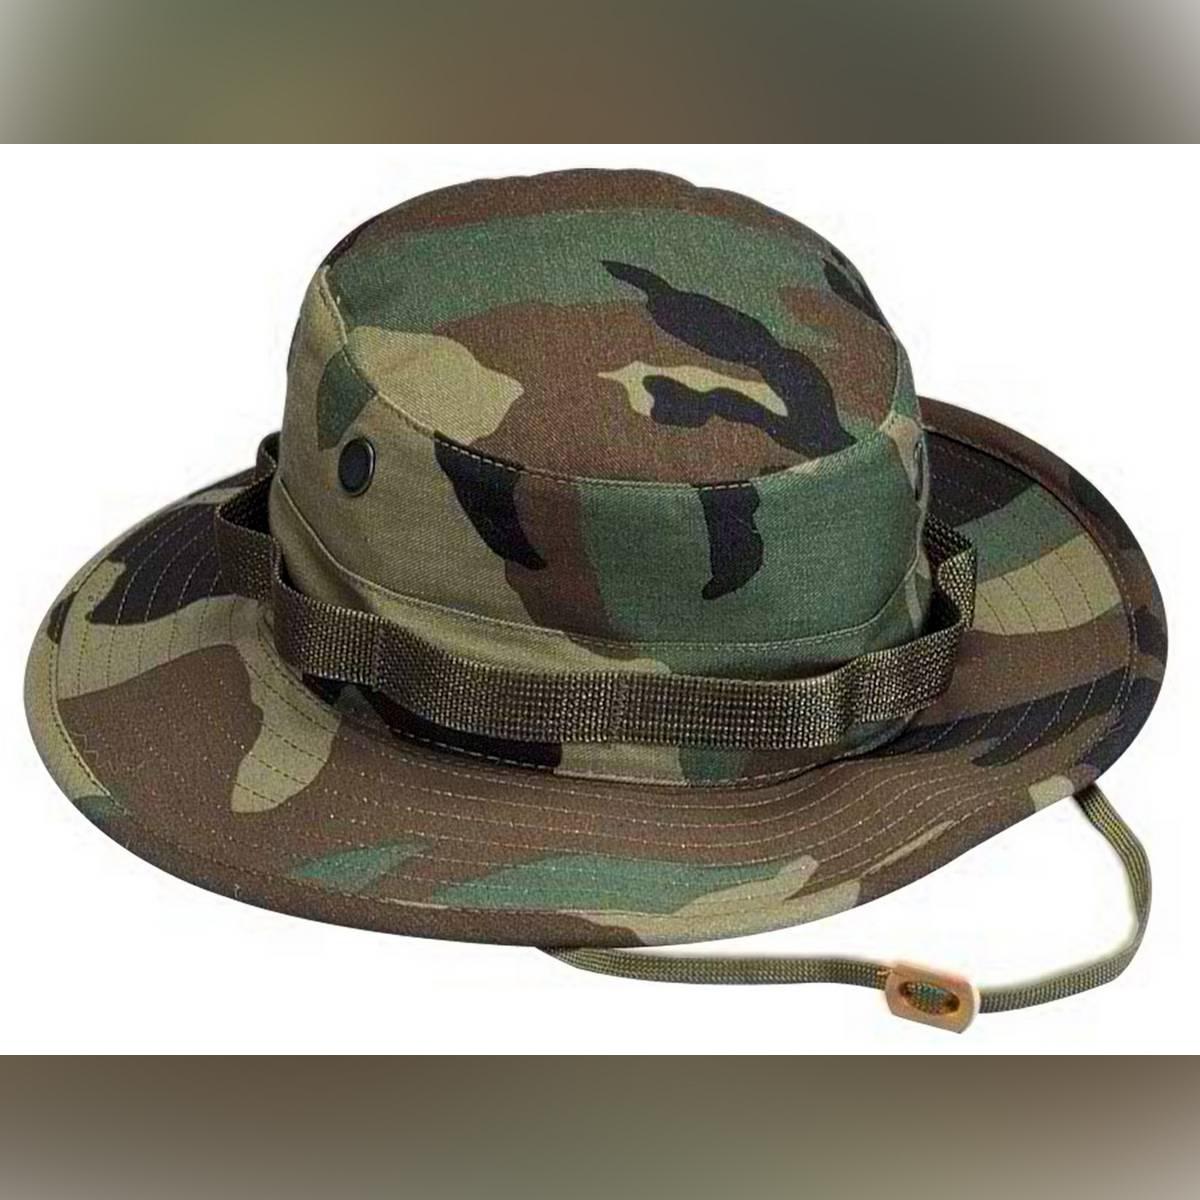 Bucket Hat Summer Men Women Boonie Hat Outdoor UV Protection Wide Brim Military Hiking Fishing Sun Hat Cap